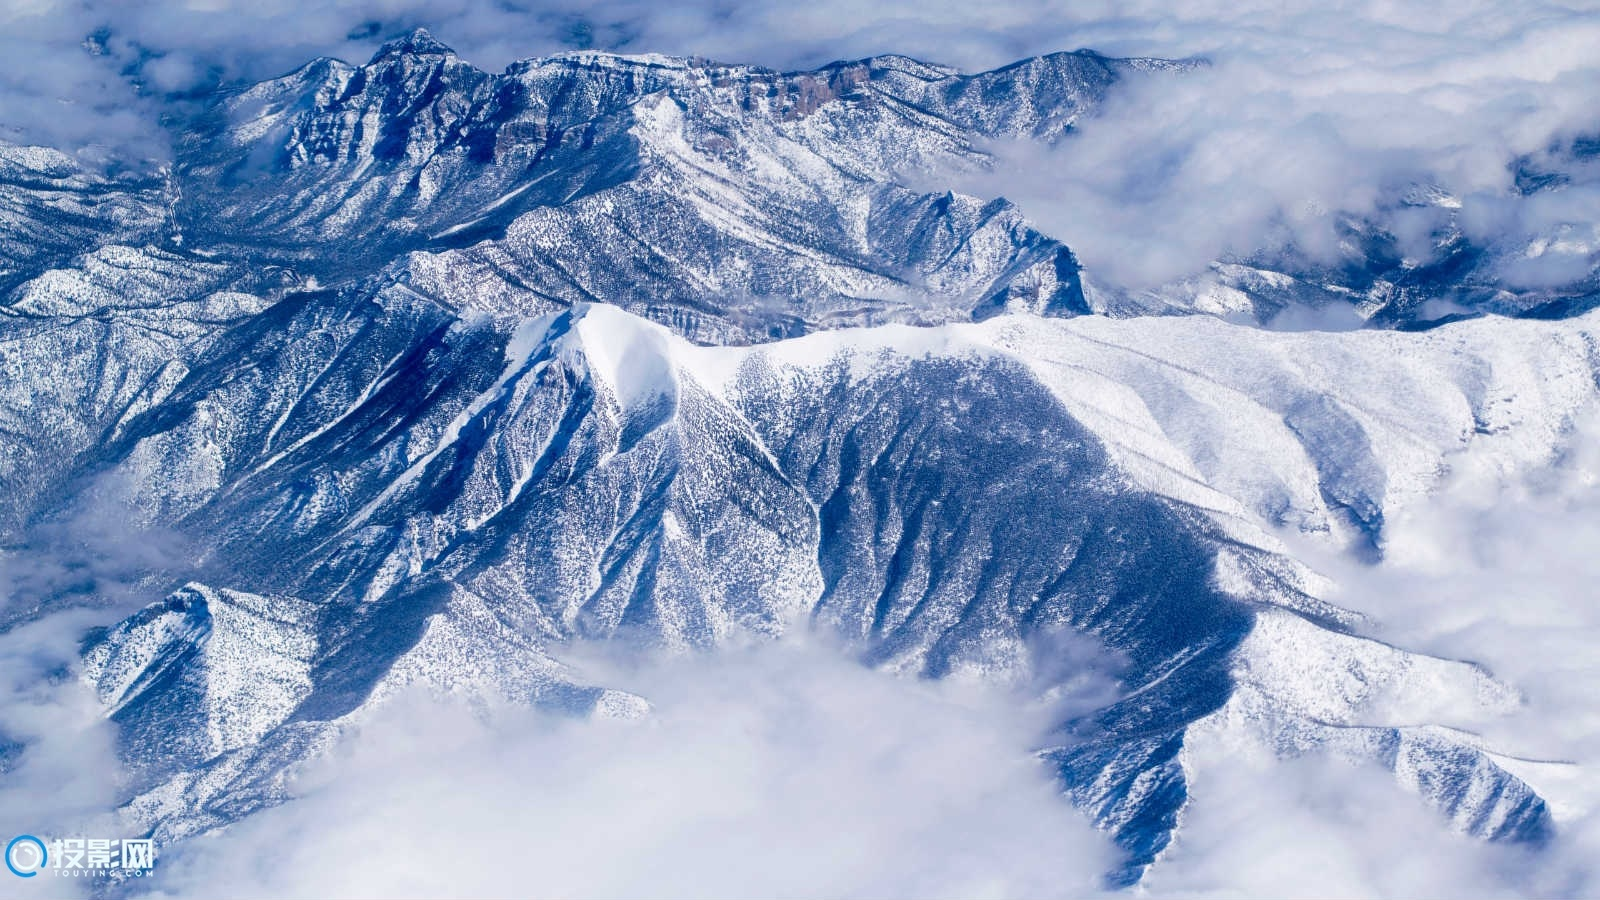 5K 唯美雪山图片壁纸11P [分辨率5120x2880x34.9MB]